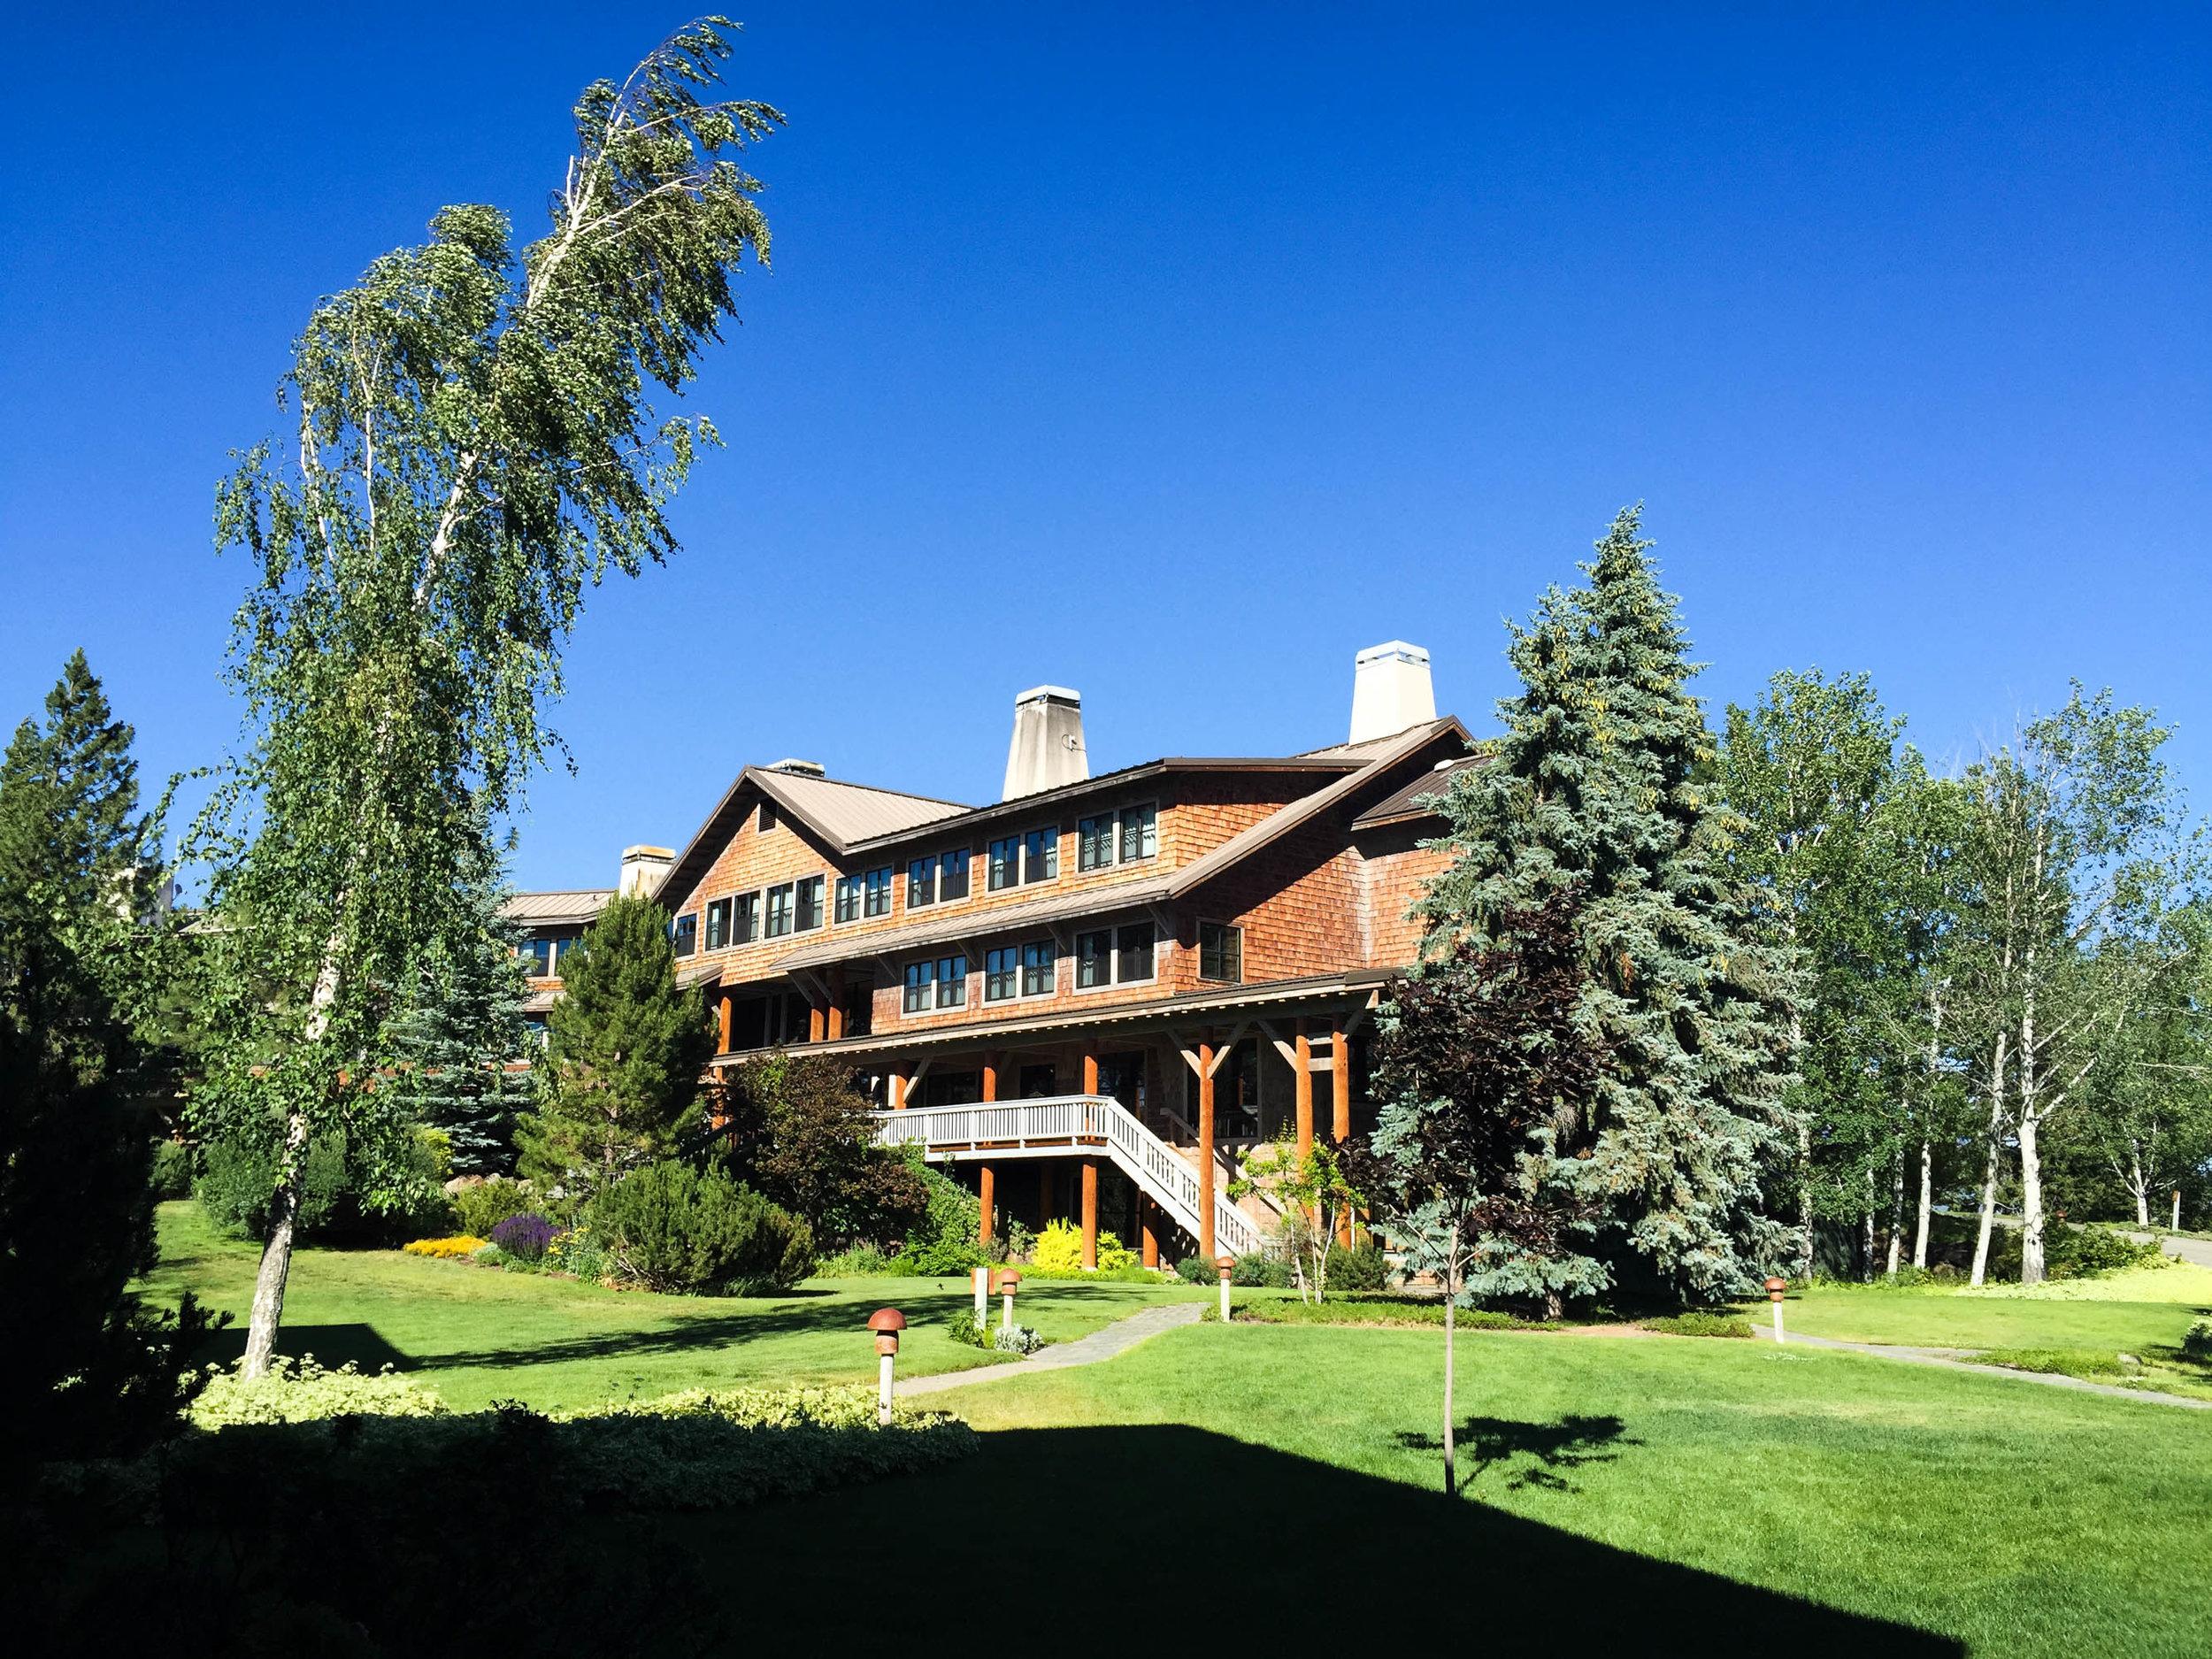 2016 ENVIRONMENTAL SEMINAR PRESENTATIONS - Sun Mountain Lodge | Winthrop, WASeptember 29-October 1, 2016